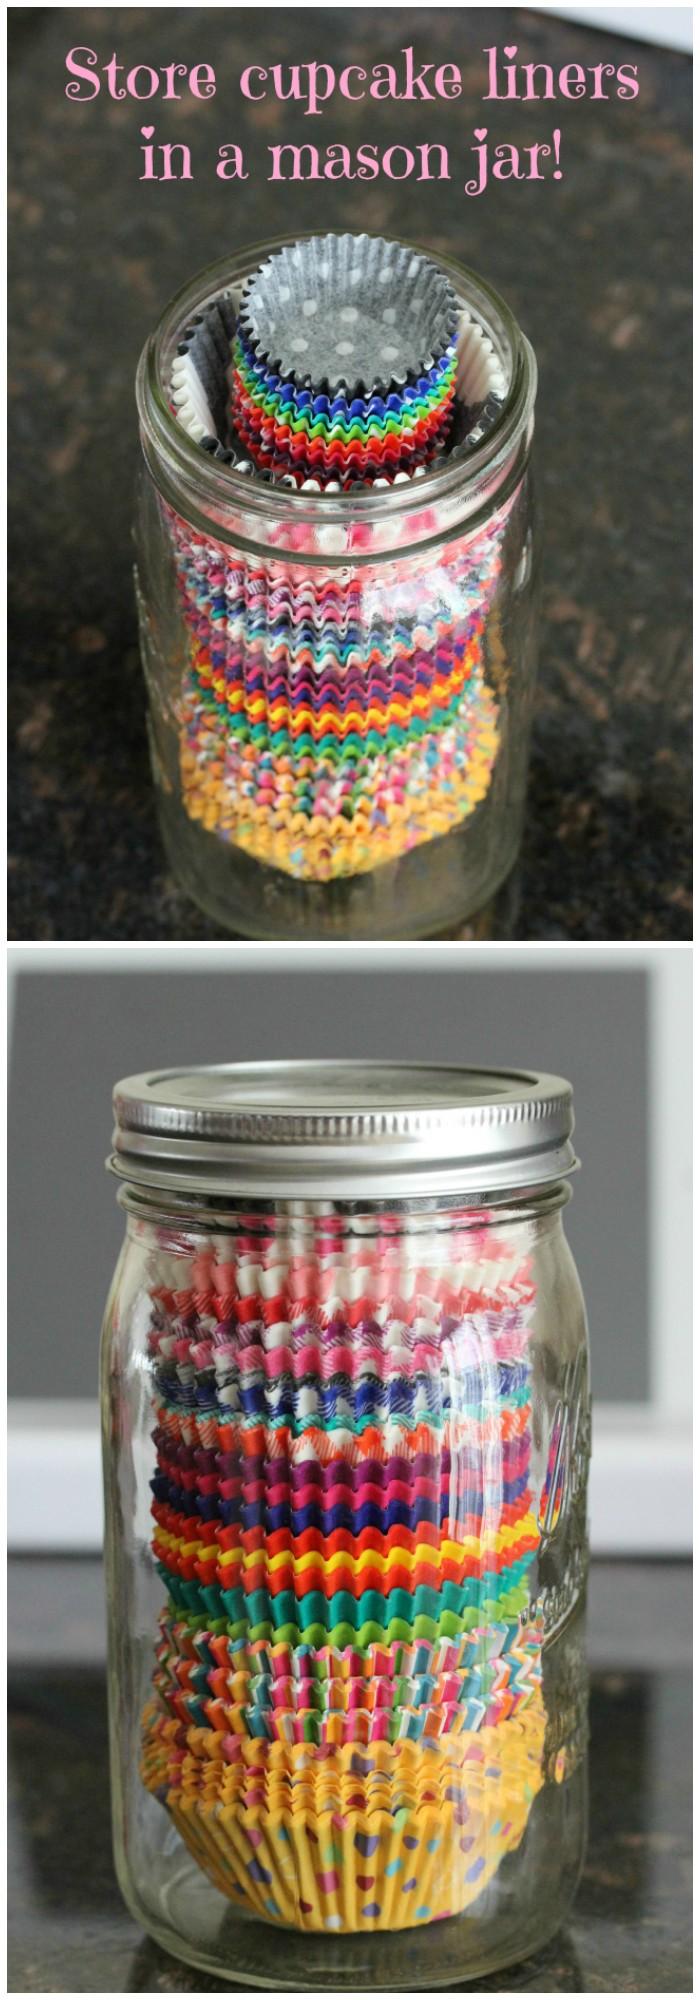 cupcake liners in a mason jar